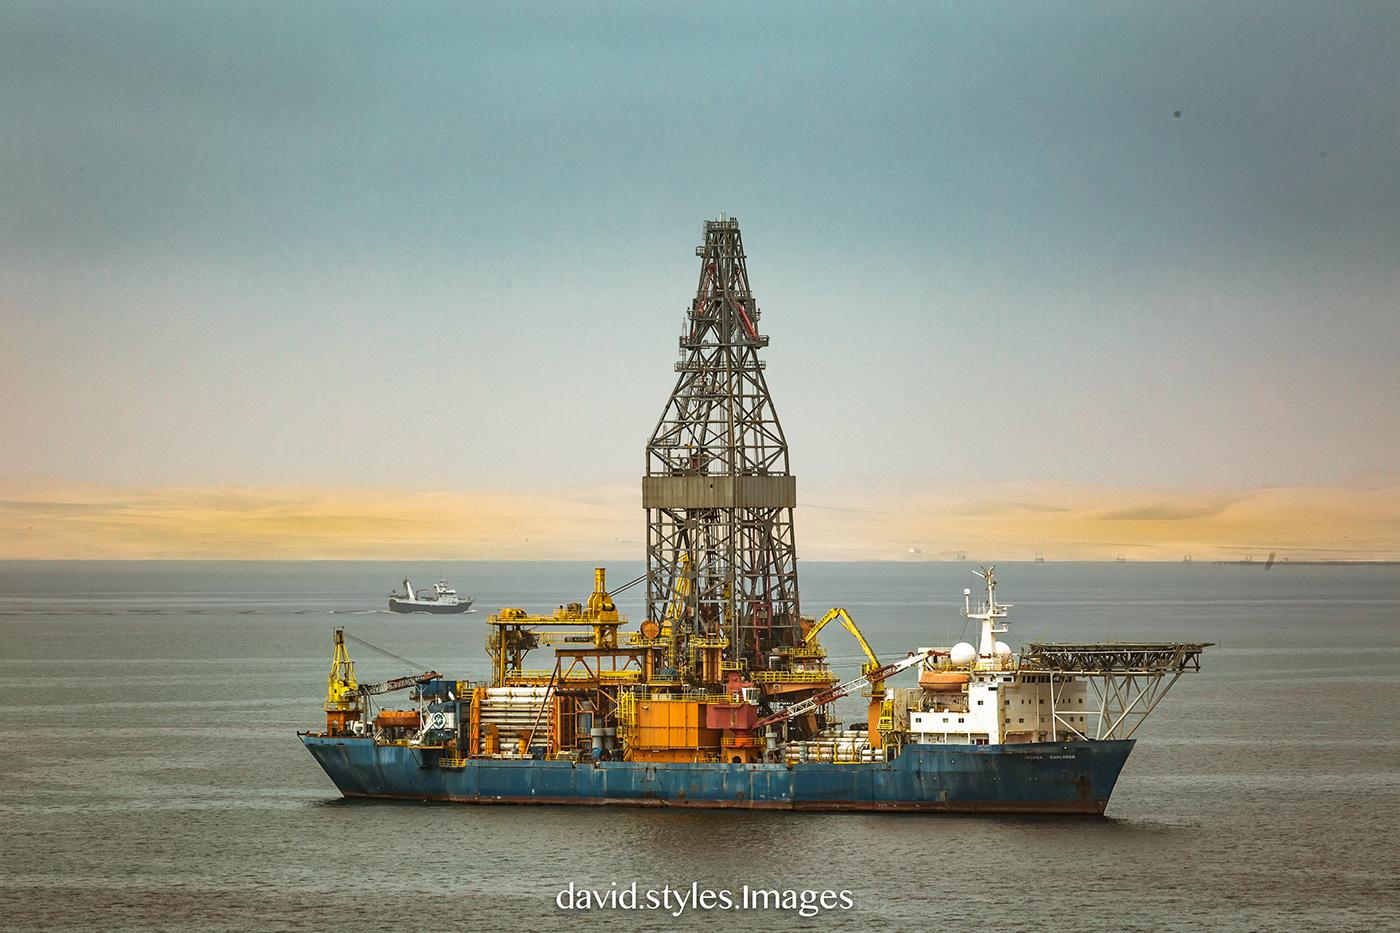 Adobe Portfolio OIL AND GAS offshore Semi-submersible maritime exploration drillingrig rig Offshore Vessels jack-up drilling rig drilling petroleun OilandGas dril drill